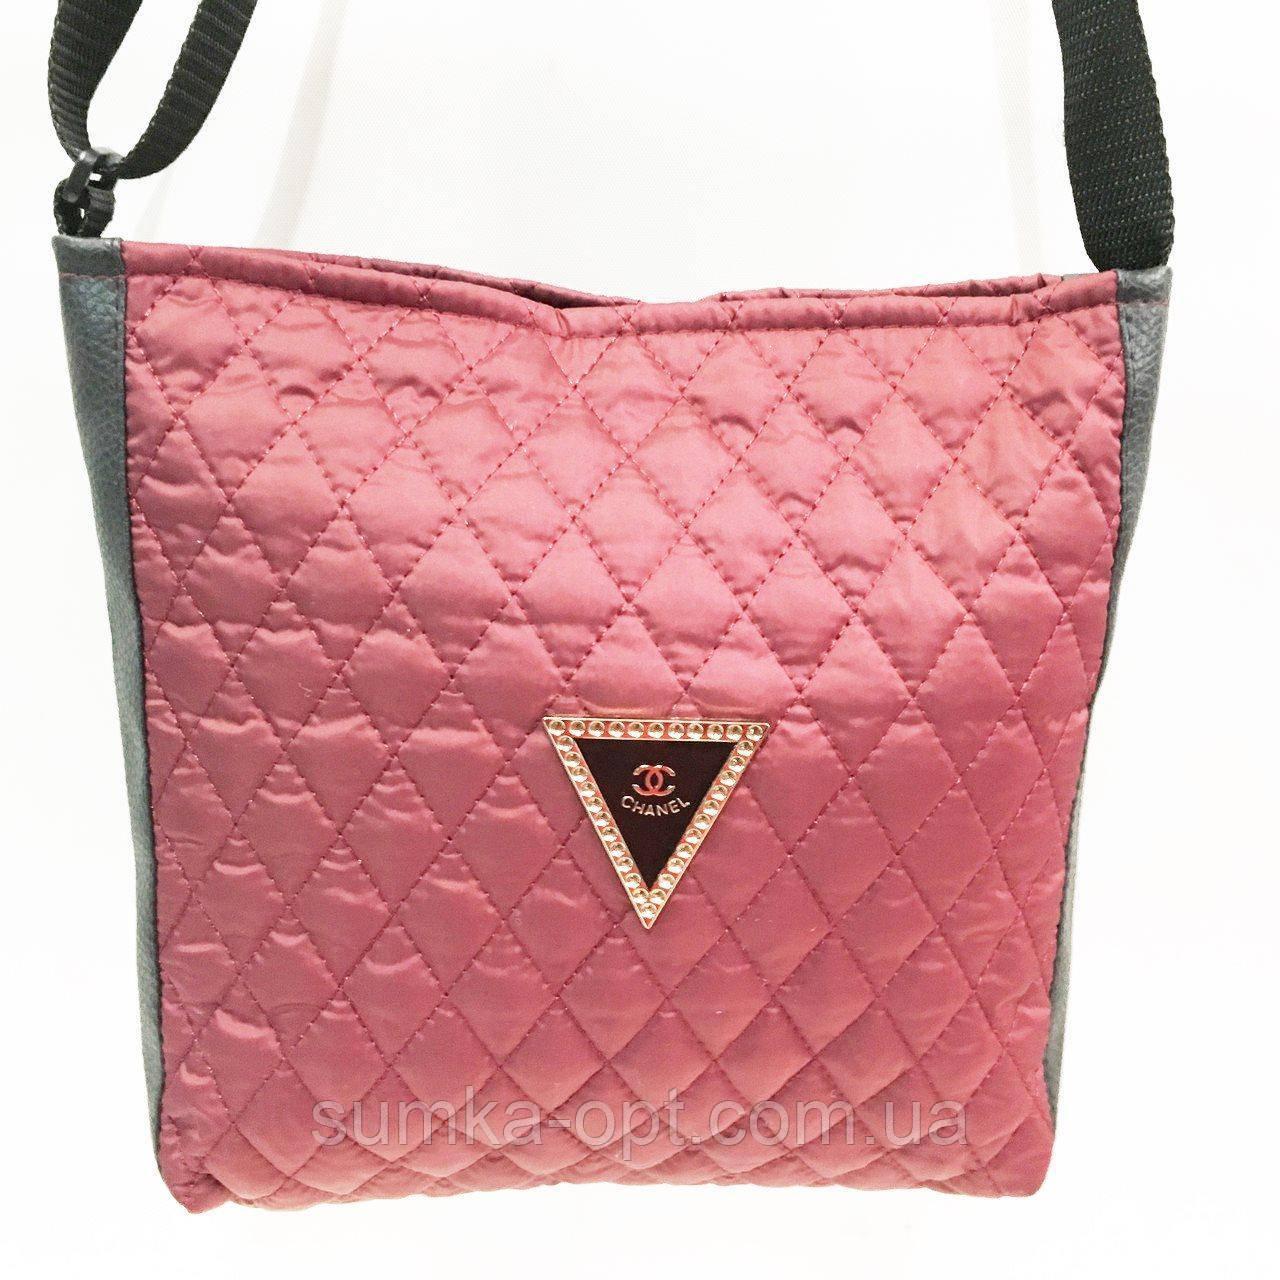 Стеганные сумочки и клатчи на плечо Chanel (БОРДО)23*28см